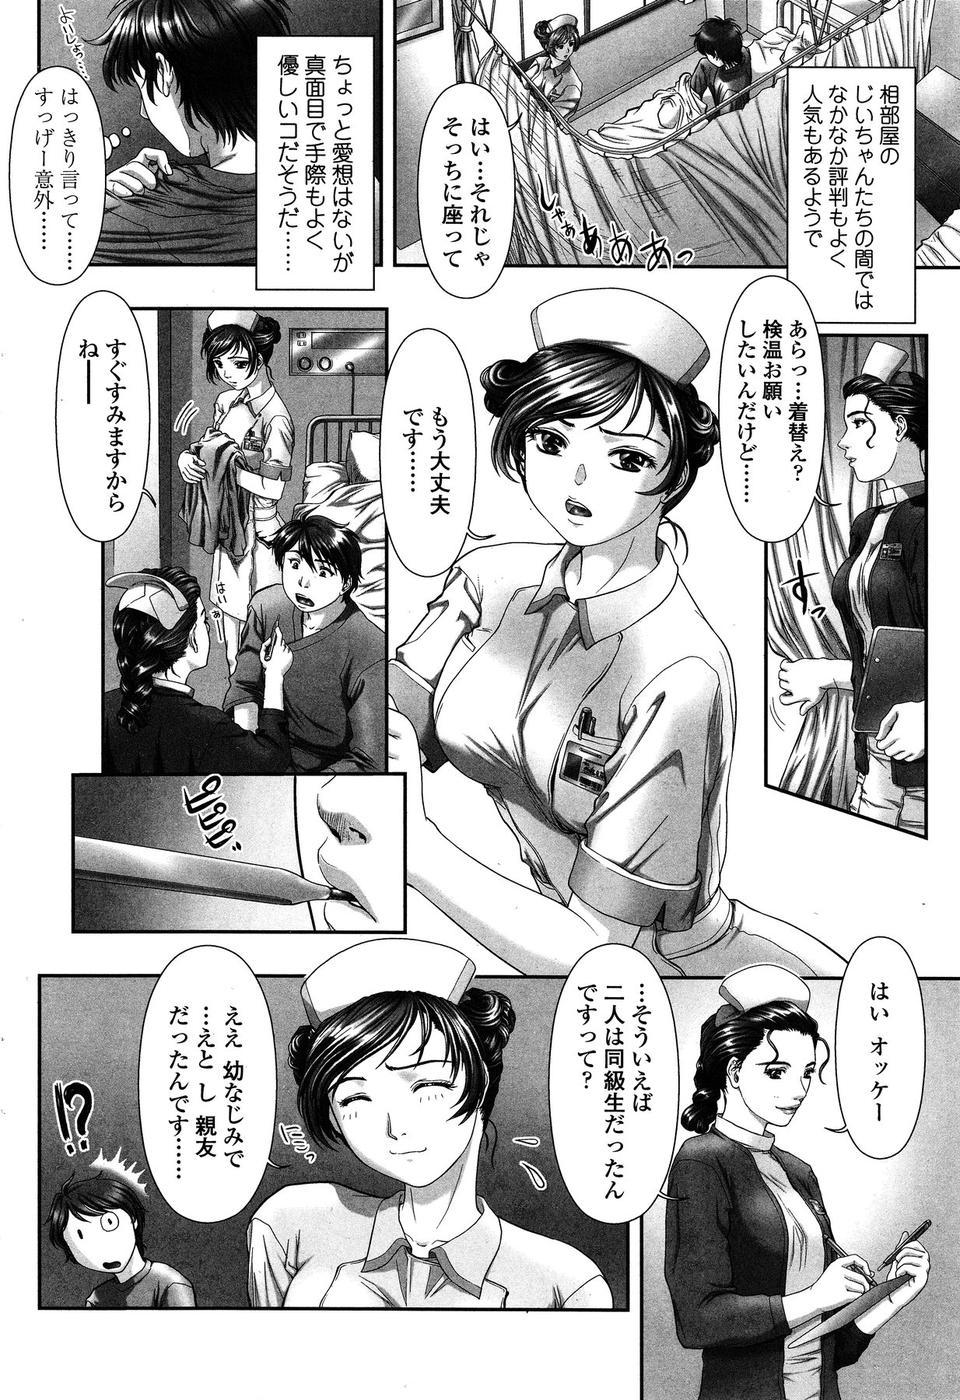 COMIC SIGMA 2009-01 Vol.28 22